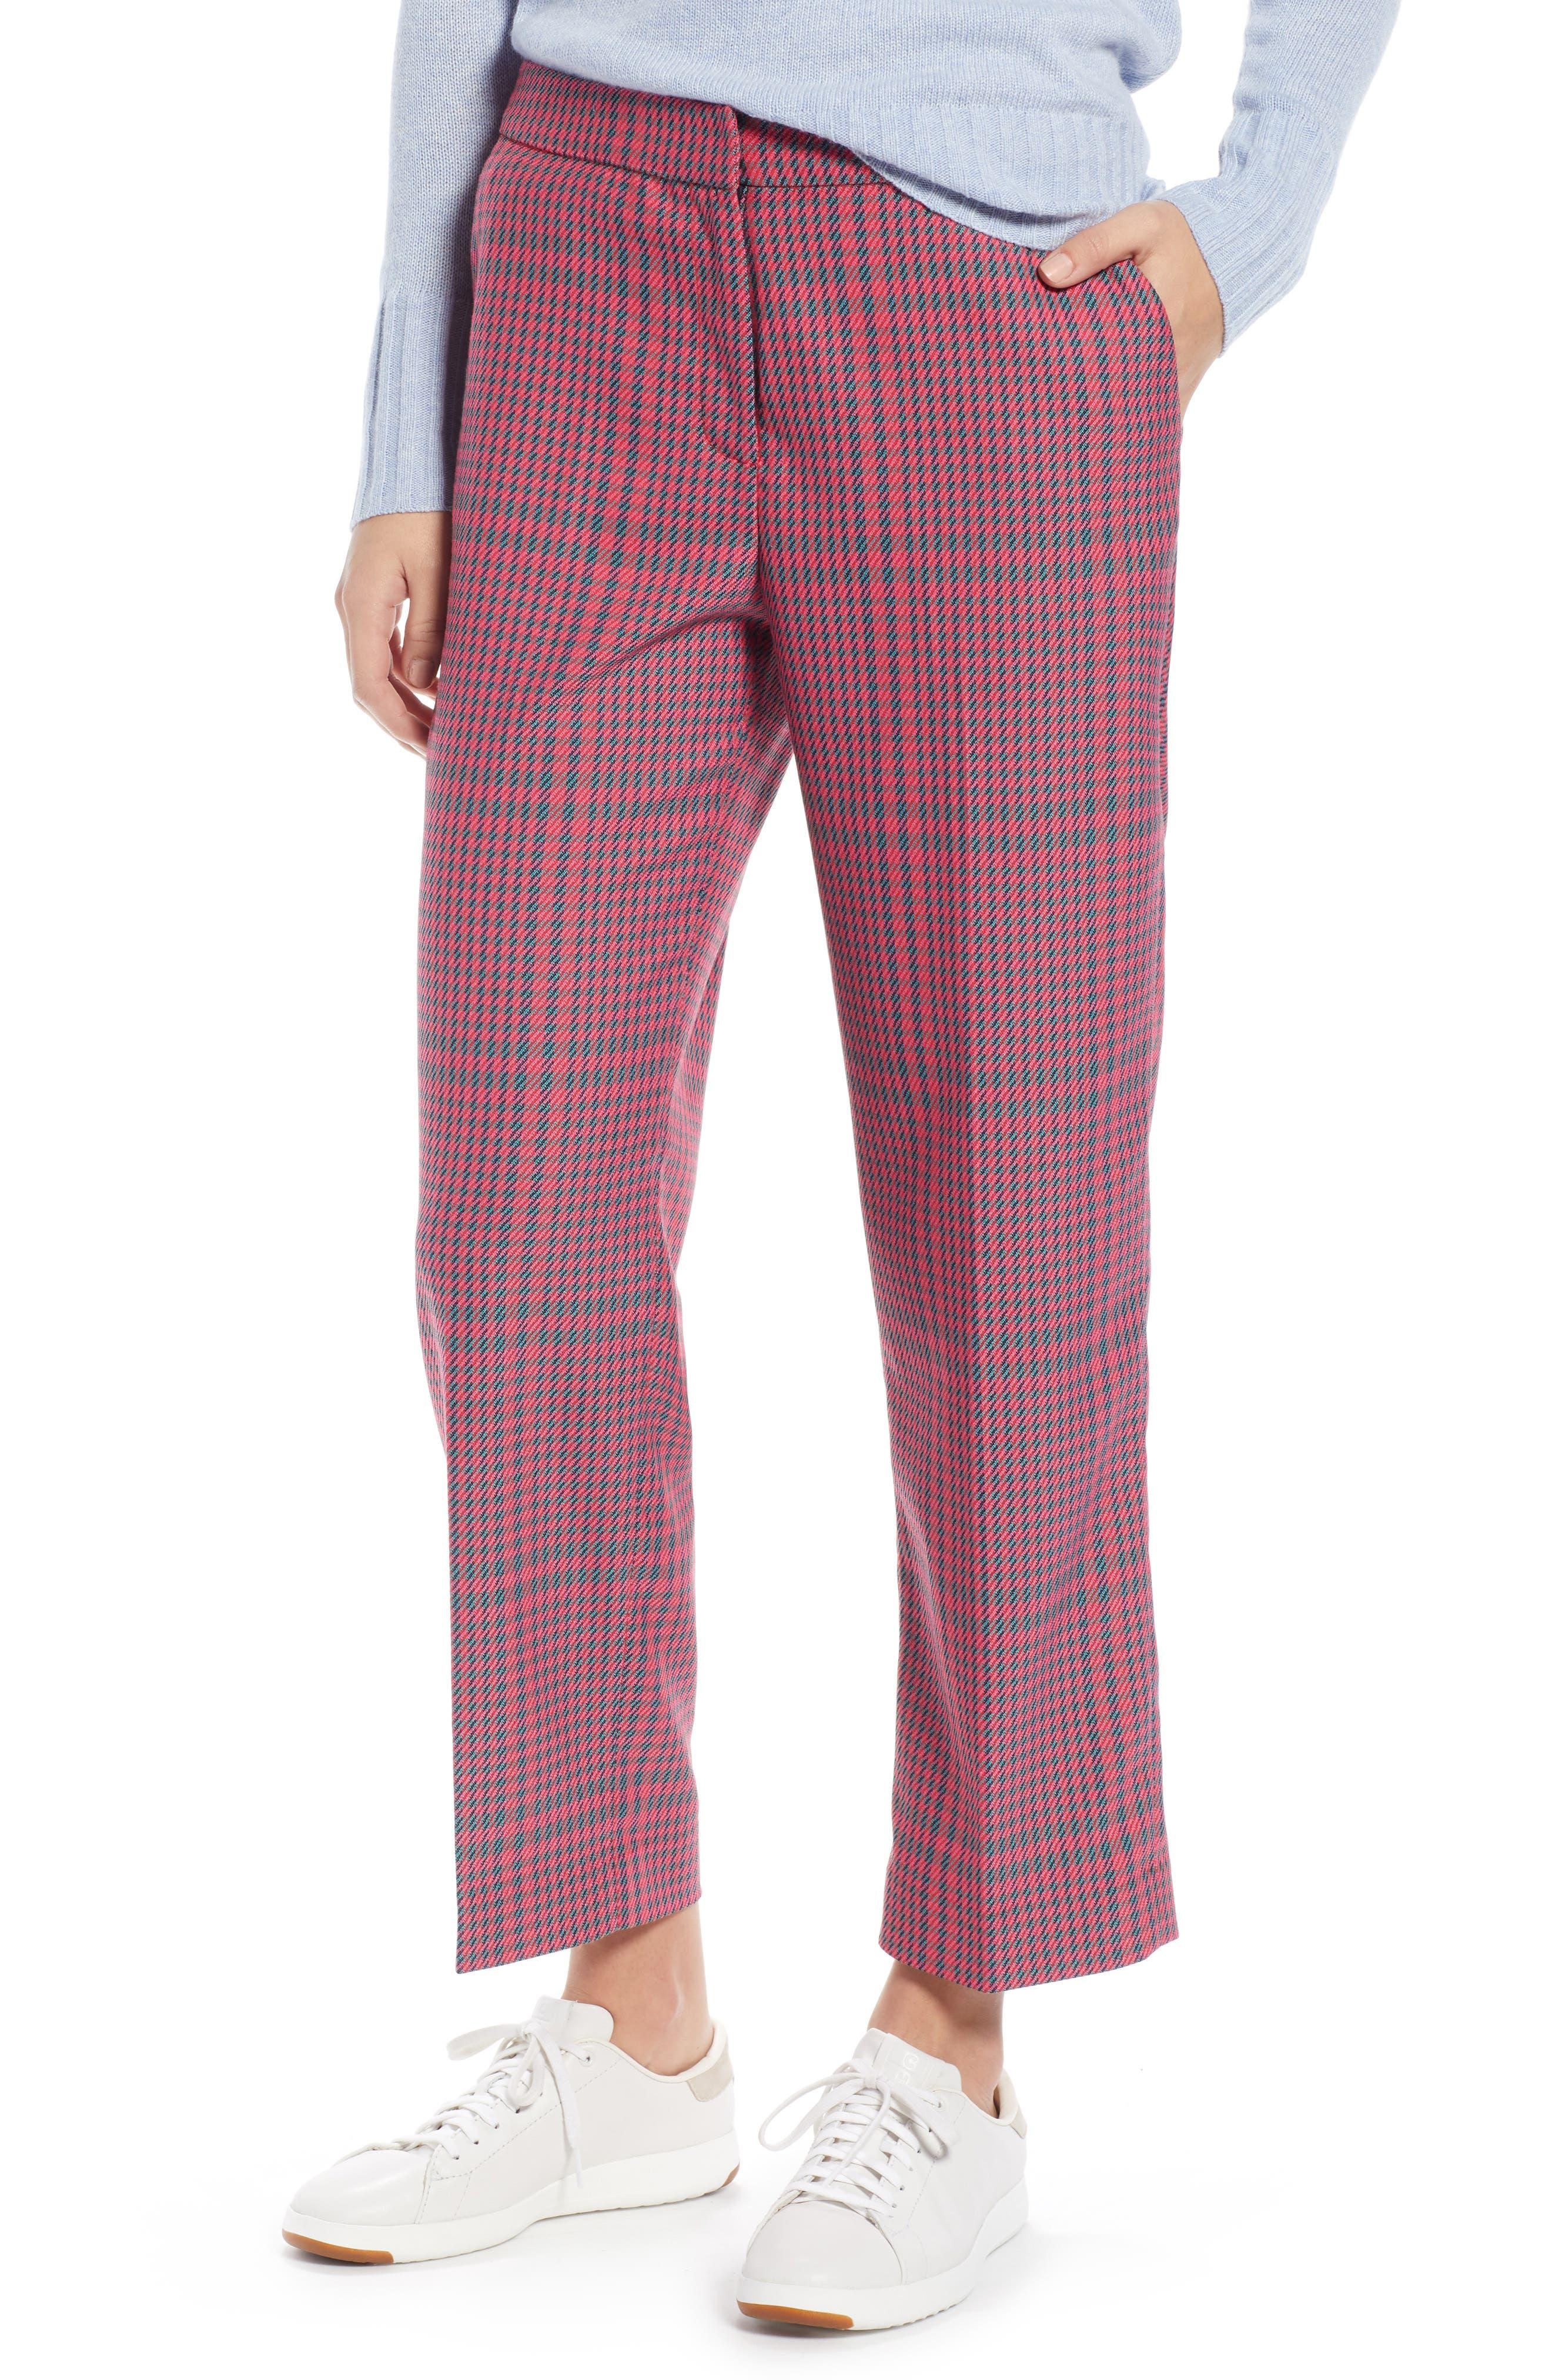 1901 Straight Leg Plaid Pants, Main, color, PINK SIMONE PLAID